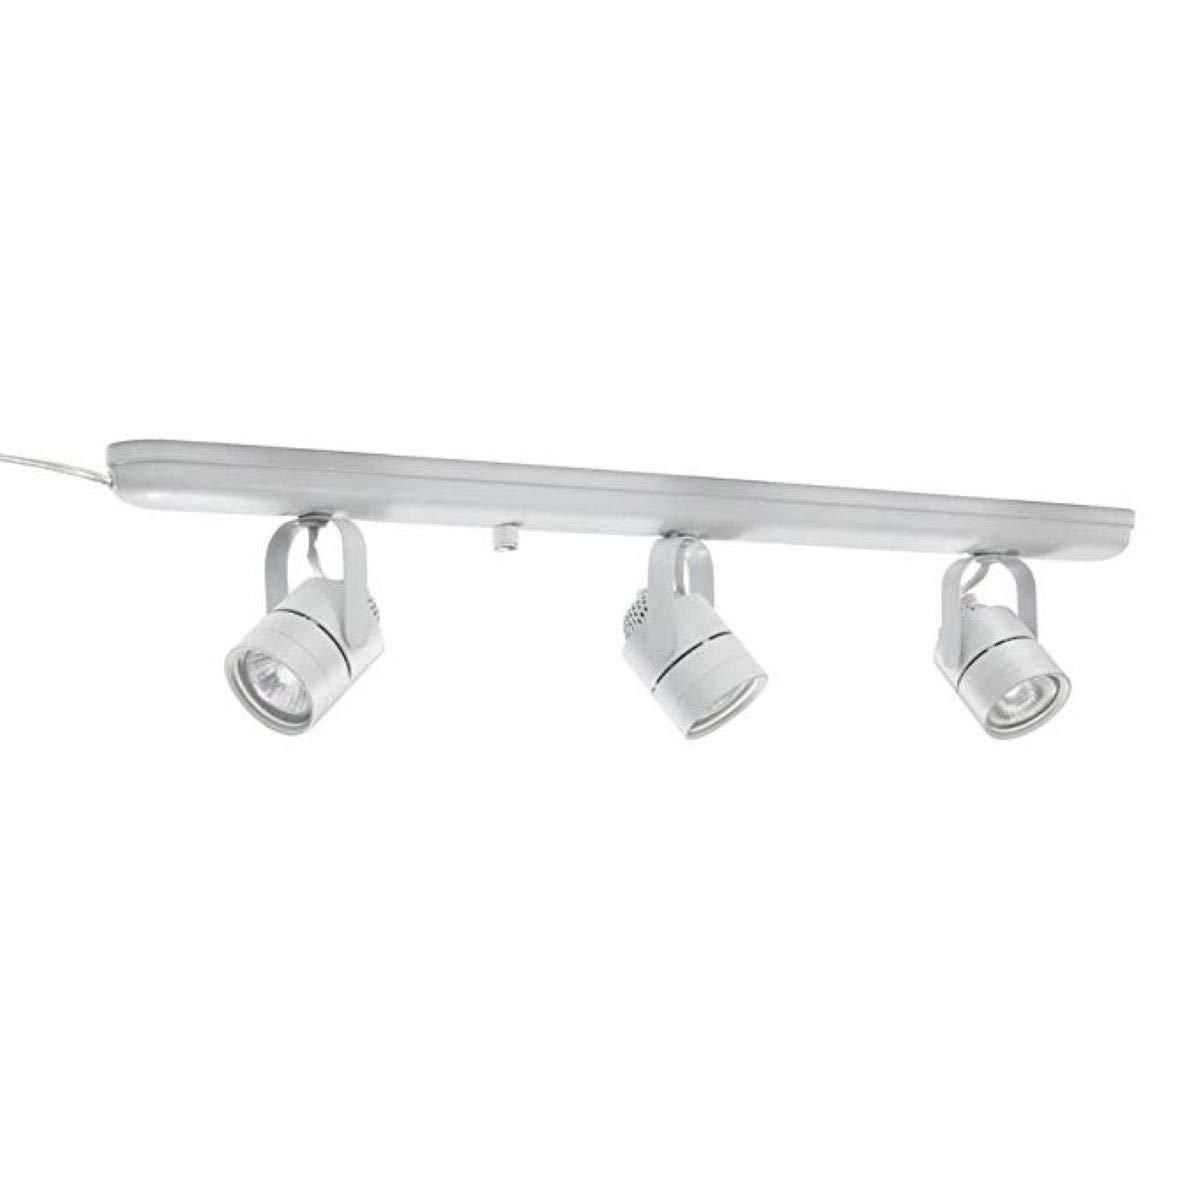 Lithonia Lighting LTKMSBK MR16GU10 3L MW M4 Mesh Back 3-Light Halogen Track Lighting Kit, 27'', White